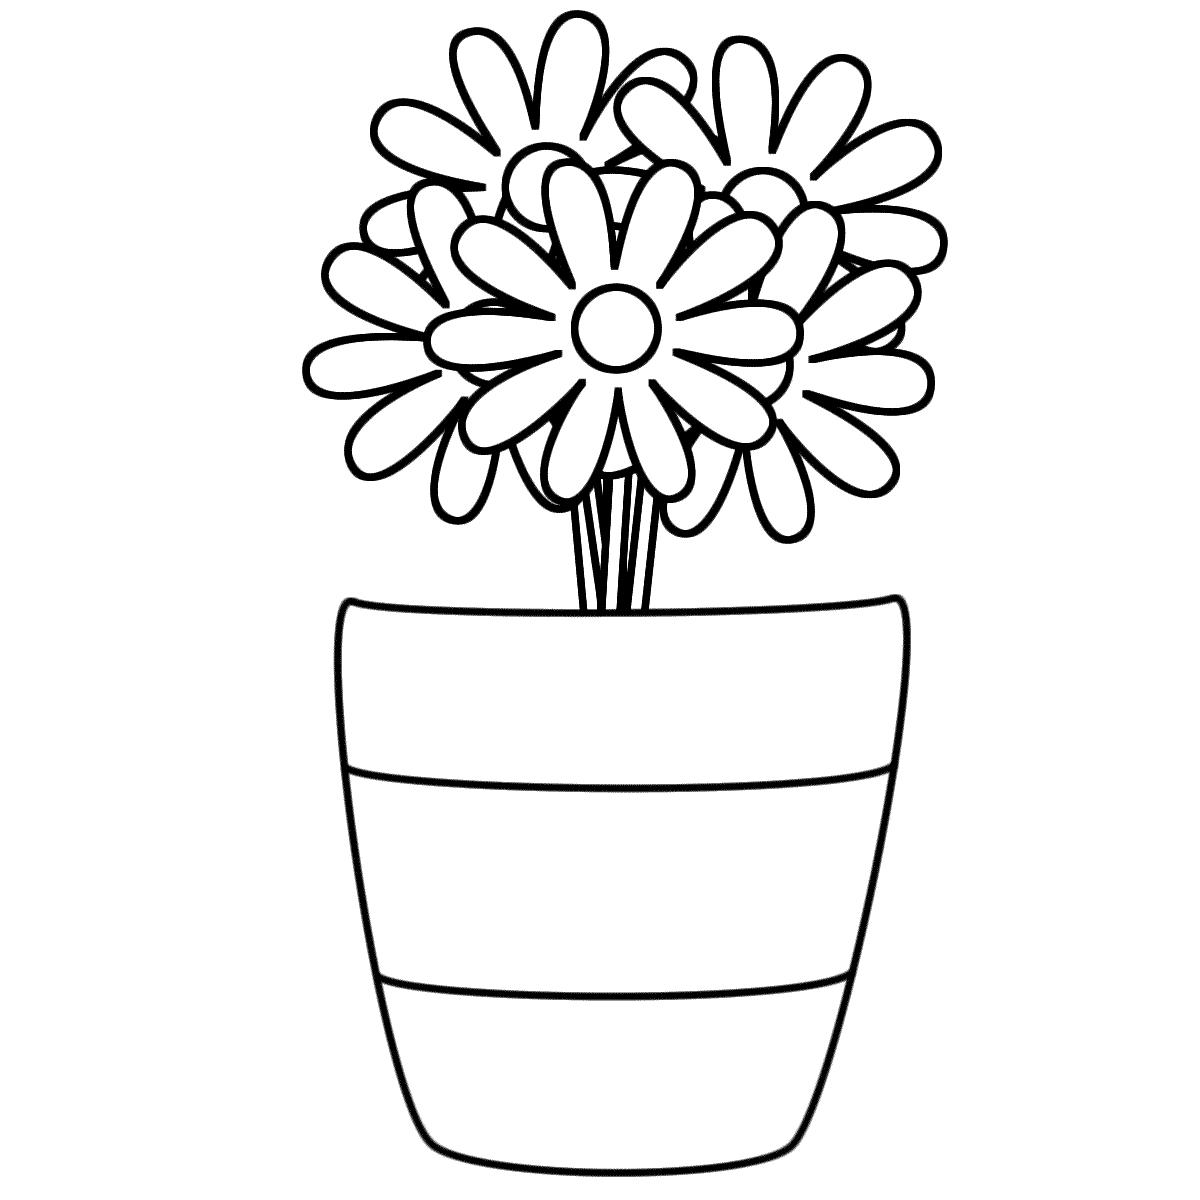 Vase coloring #15, Download drawings